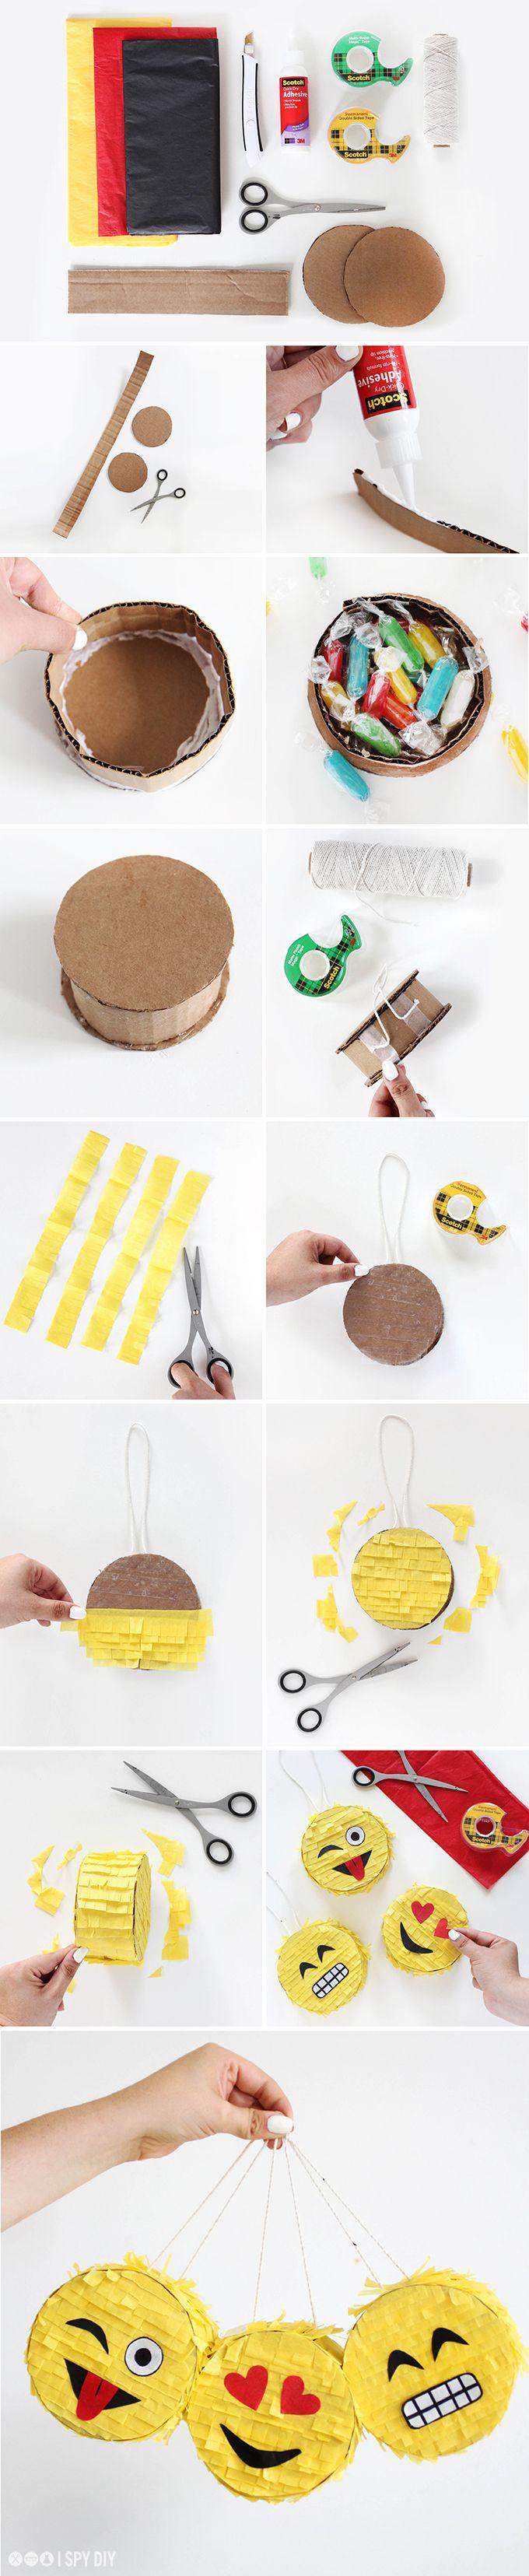 STEPS |Mini Emoji Piñata | I SPY DIY